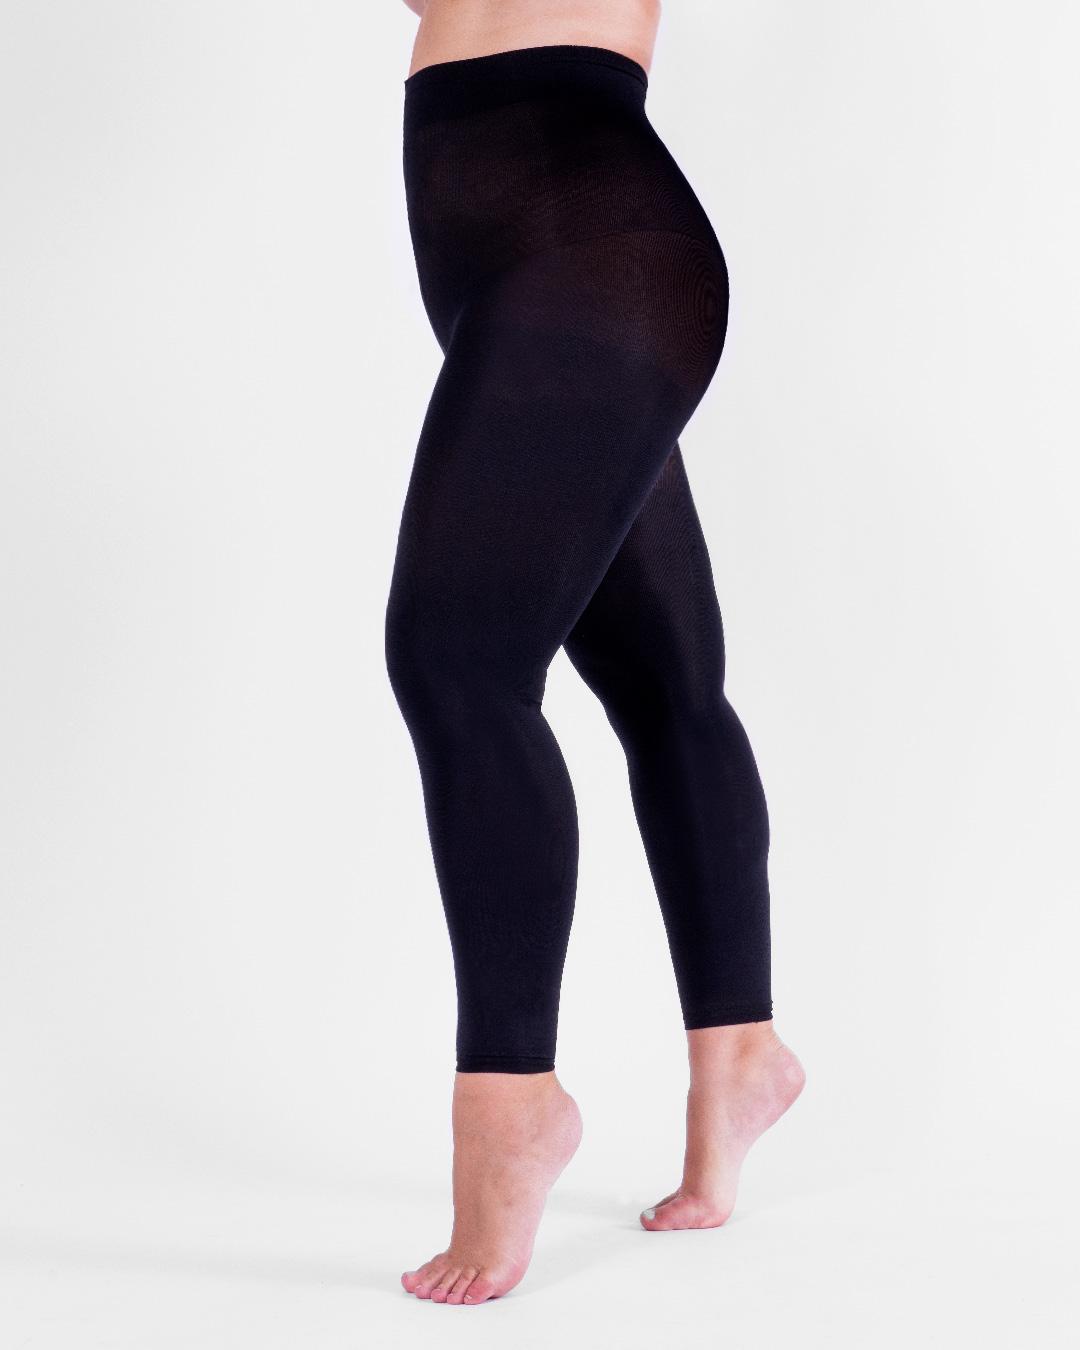 personalsize-exclusive-leggings-exclusive-prd_004.jpg